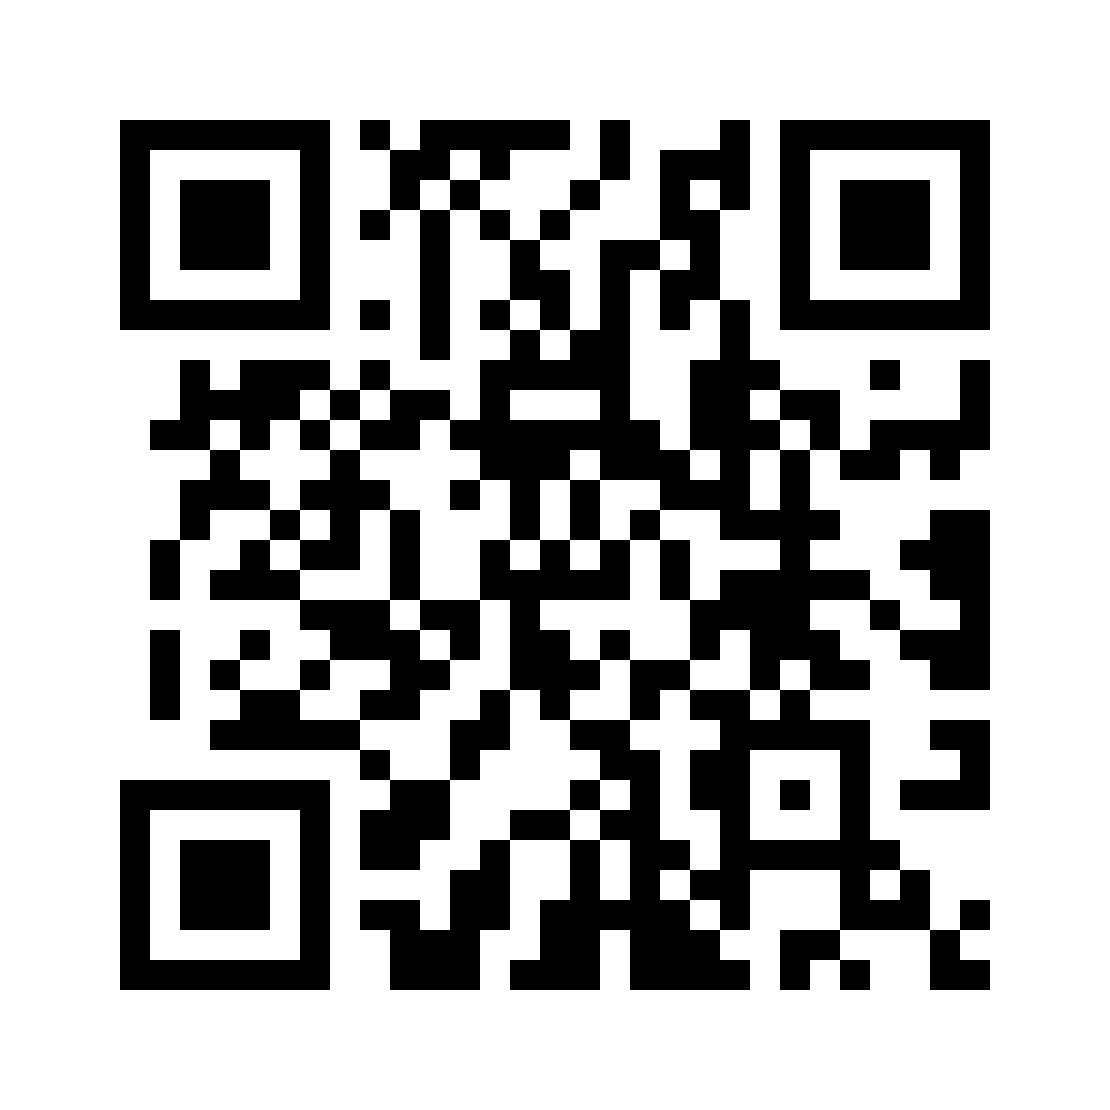 iphone qr code scan